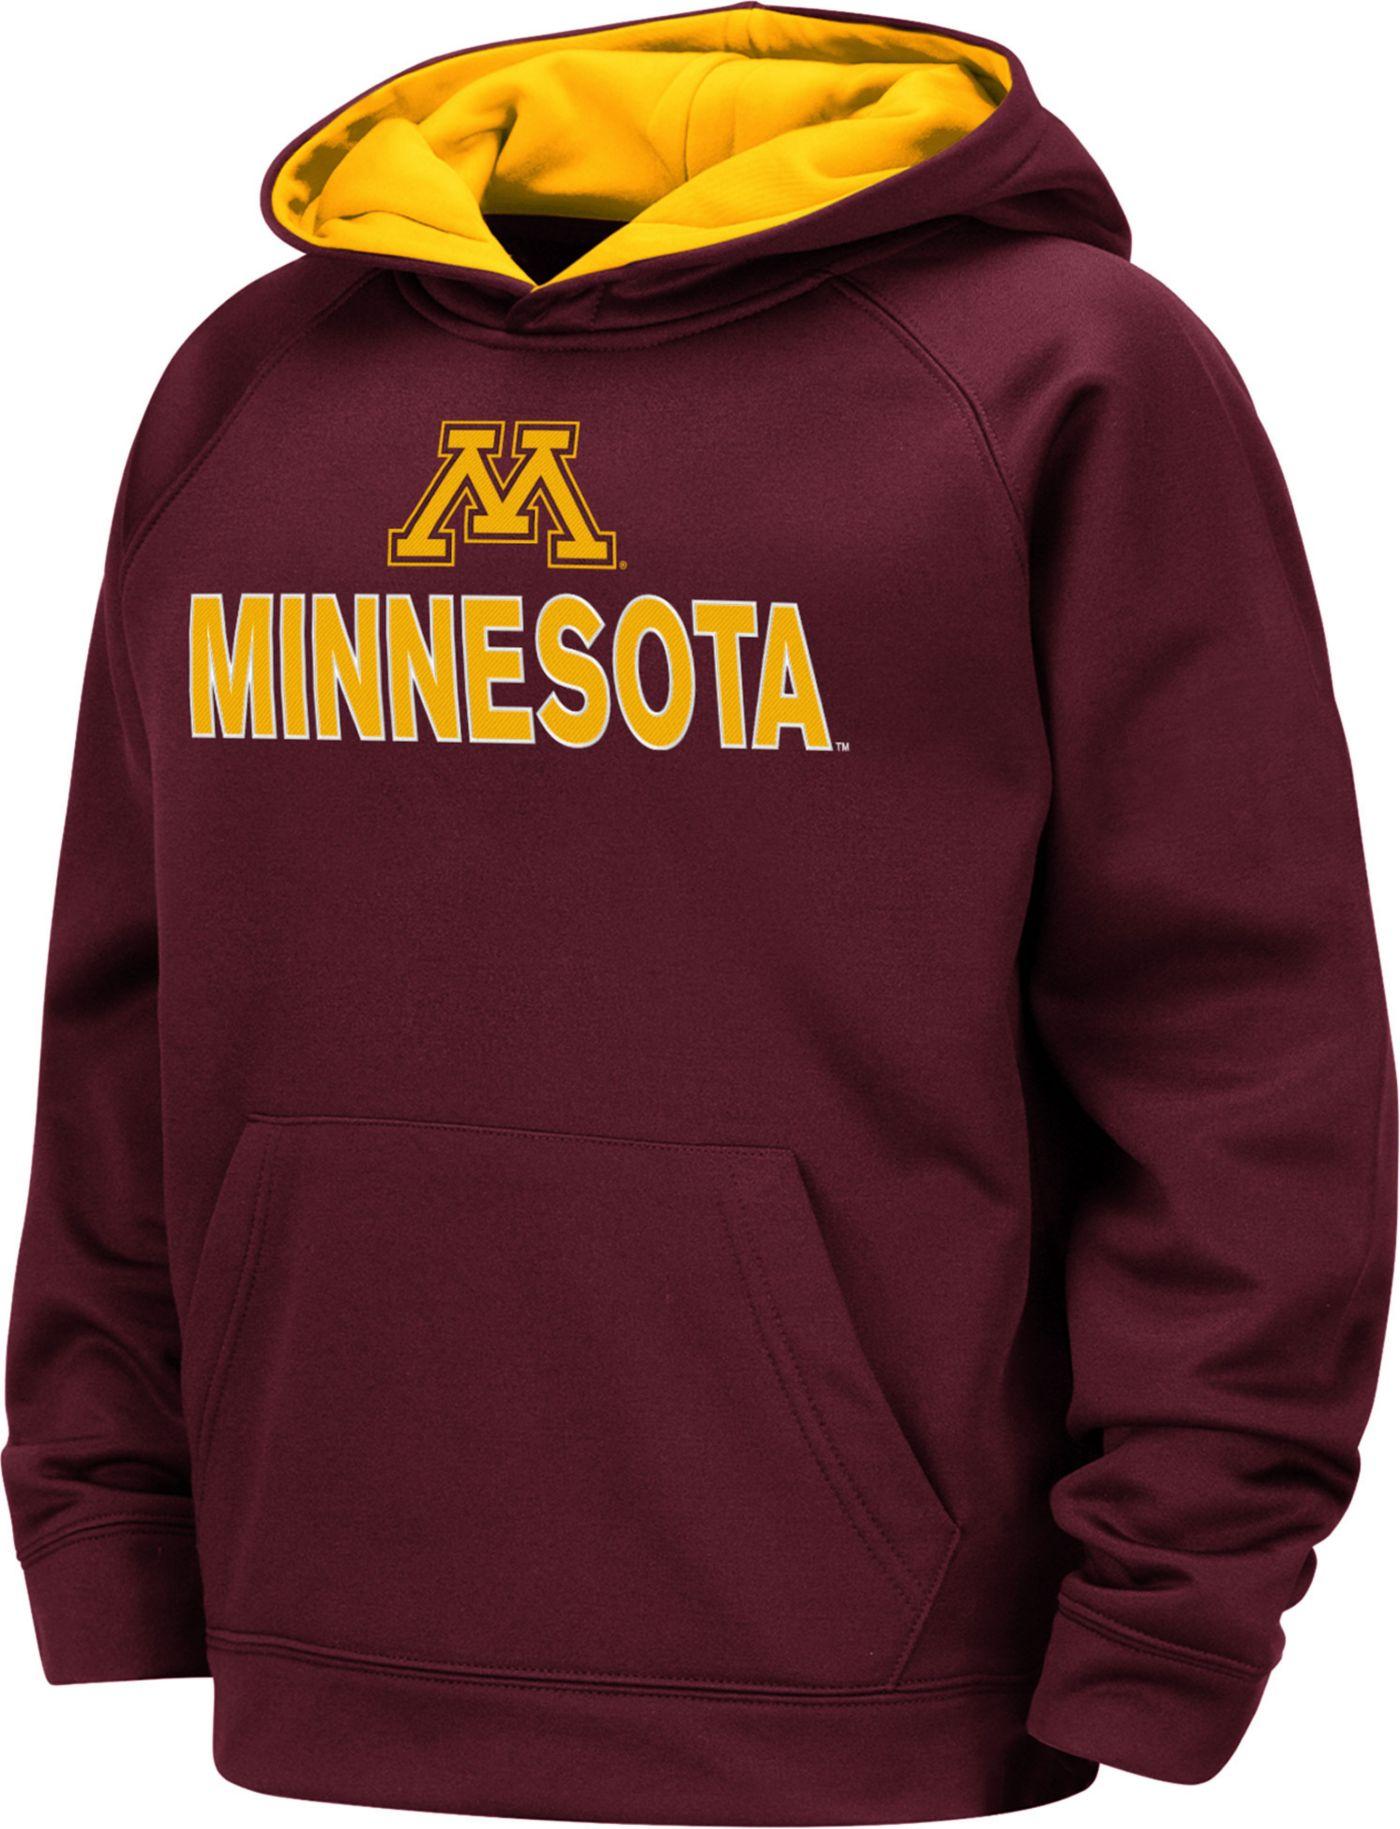 Colosseum Boys' Minnesota Golden Gophers Maroon Pullover Hoodie